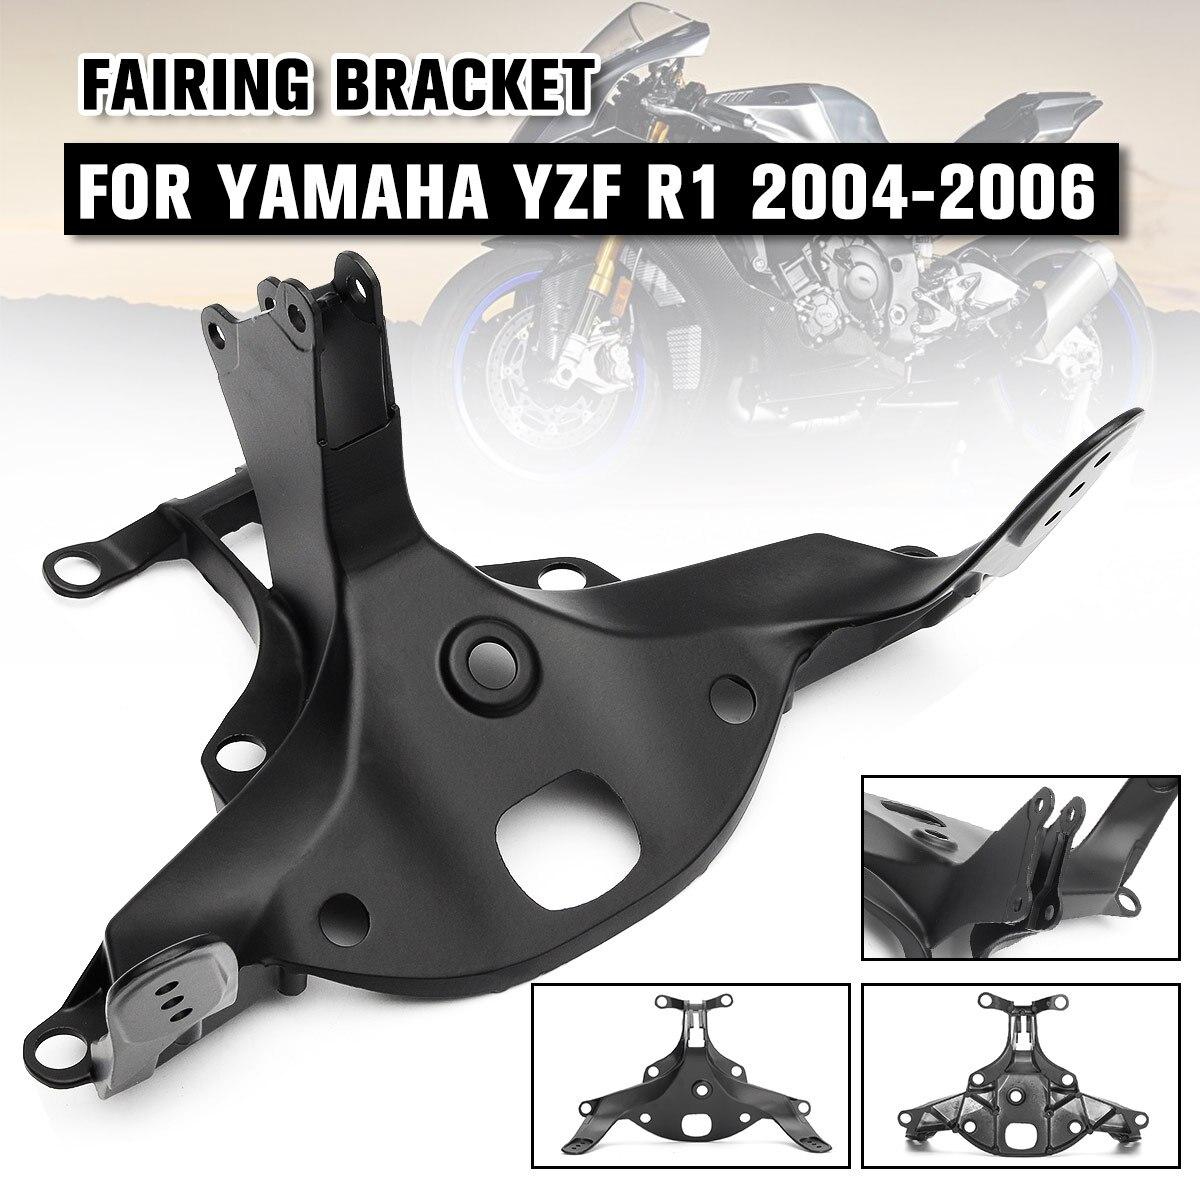 Upper Stay Fairing Cowling Headlight Bracket For Yamaha YZF R1 2009-2014